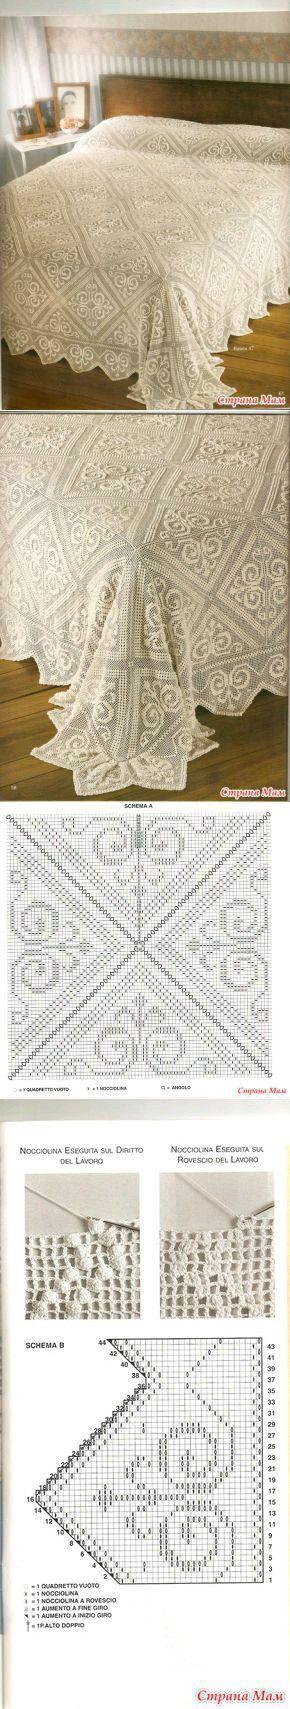 Cubre cama | Crochet | Pinterest | Camas, Colchas y Ganchillo